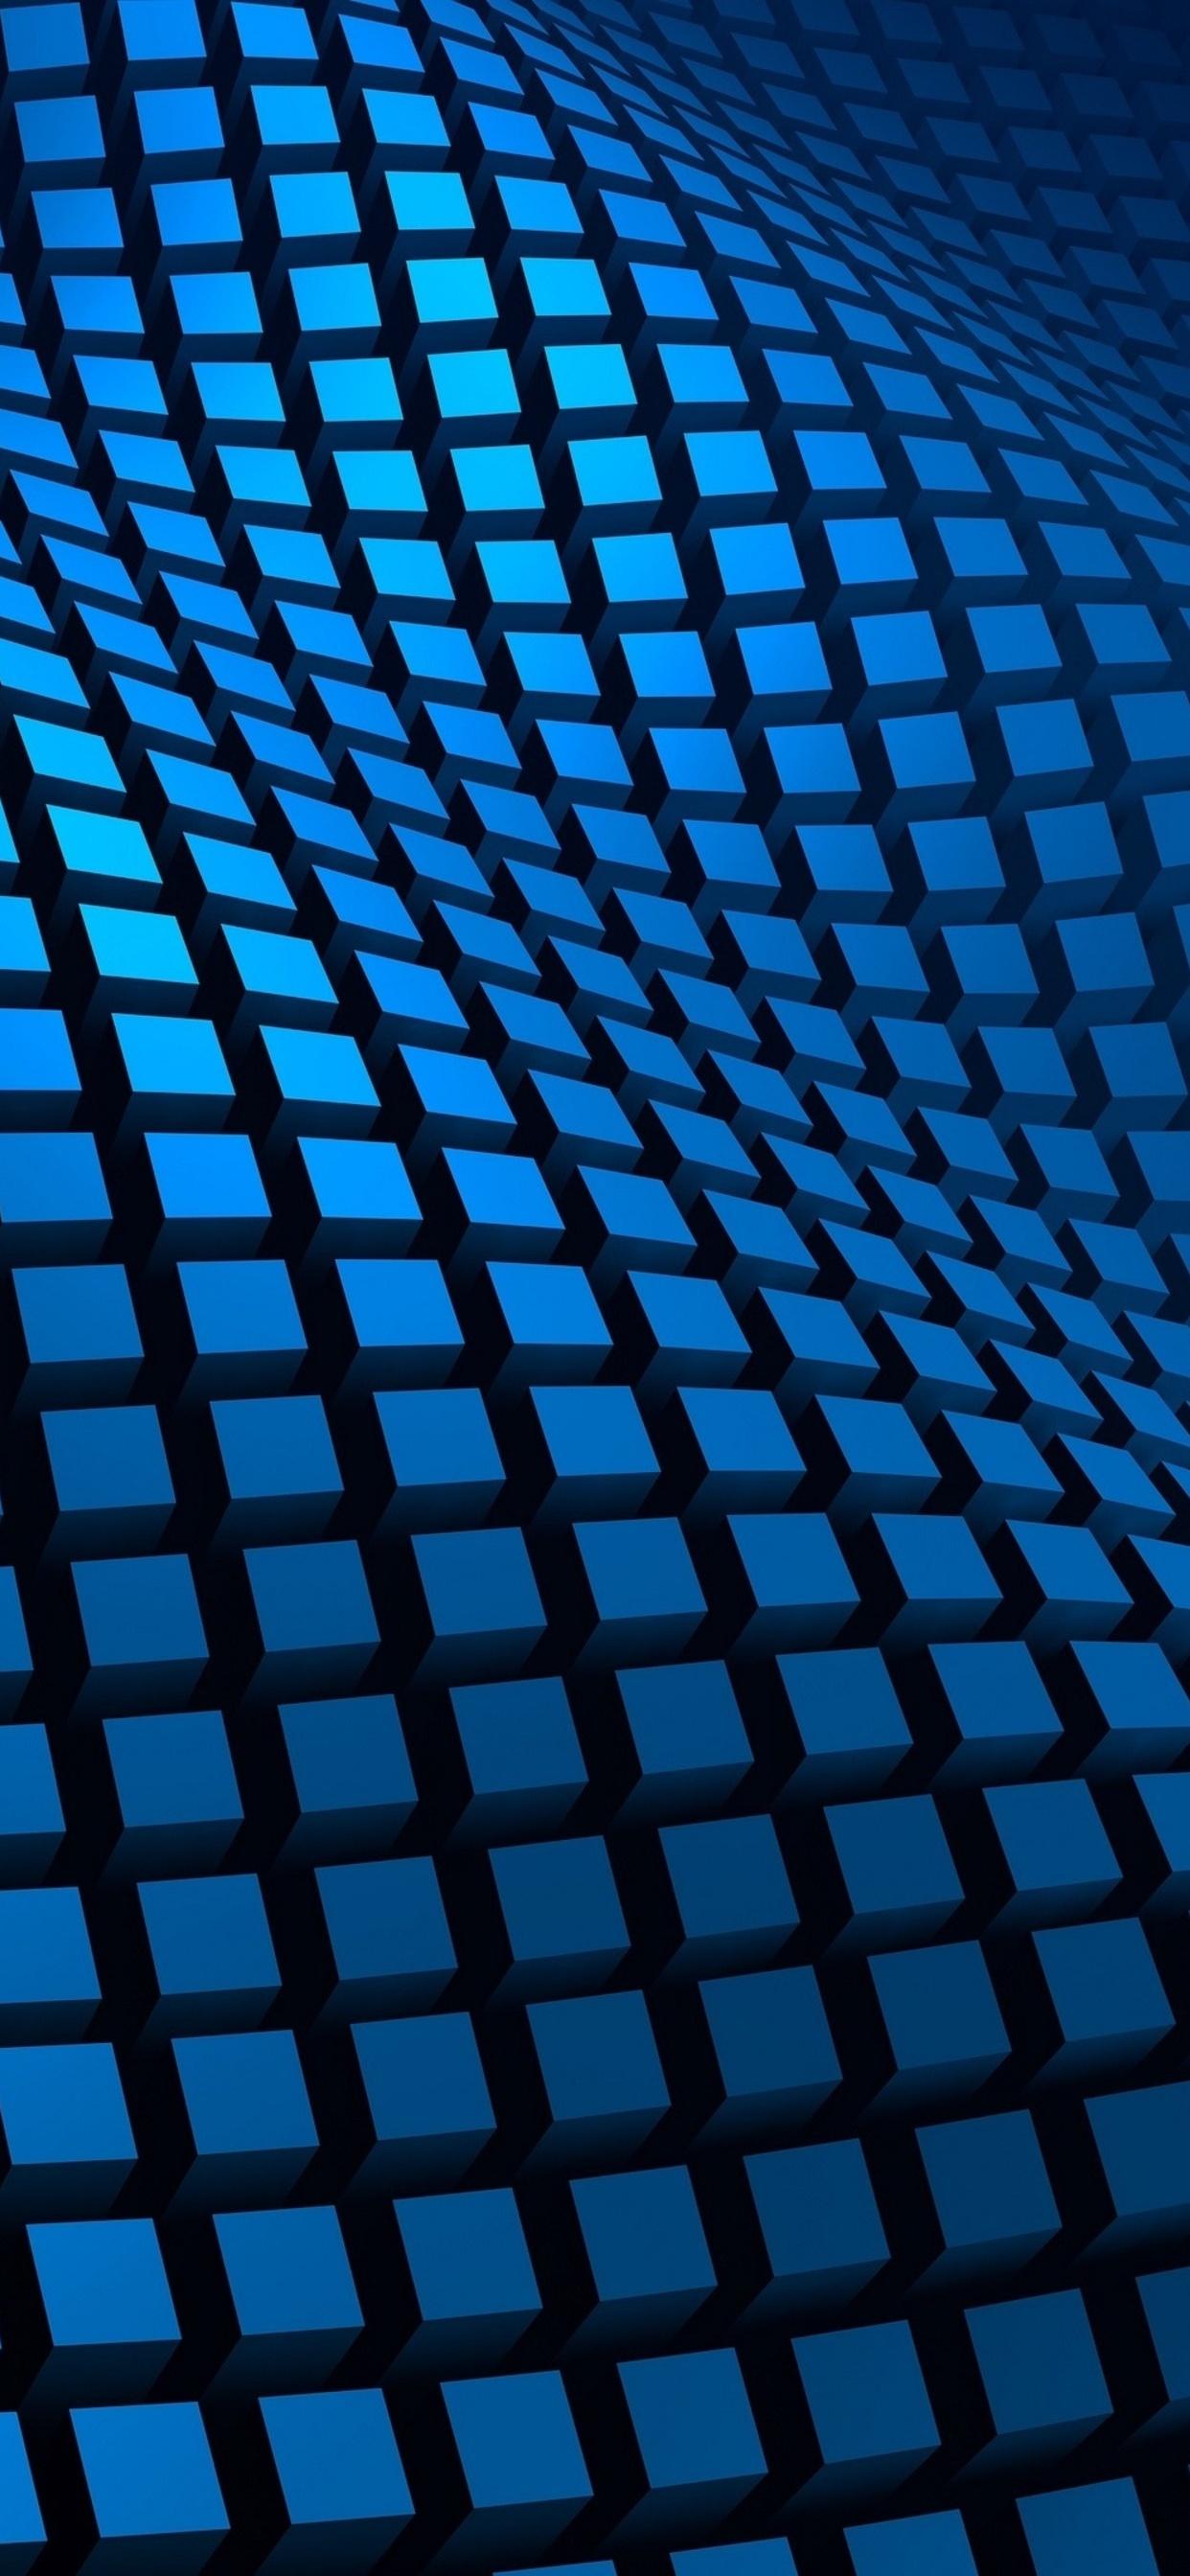 1242x2688 Blue Pattern 3d Iphone Xs Max Hd 4k Wallpapers